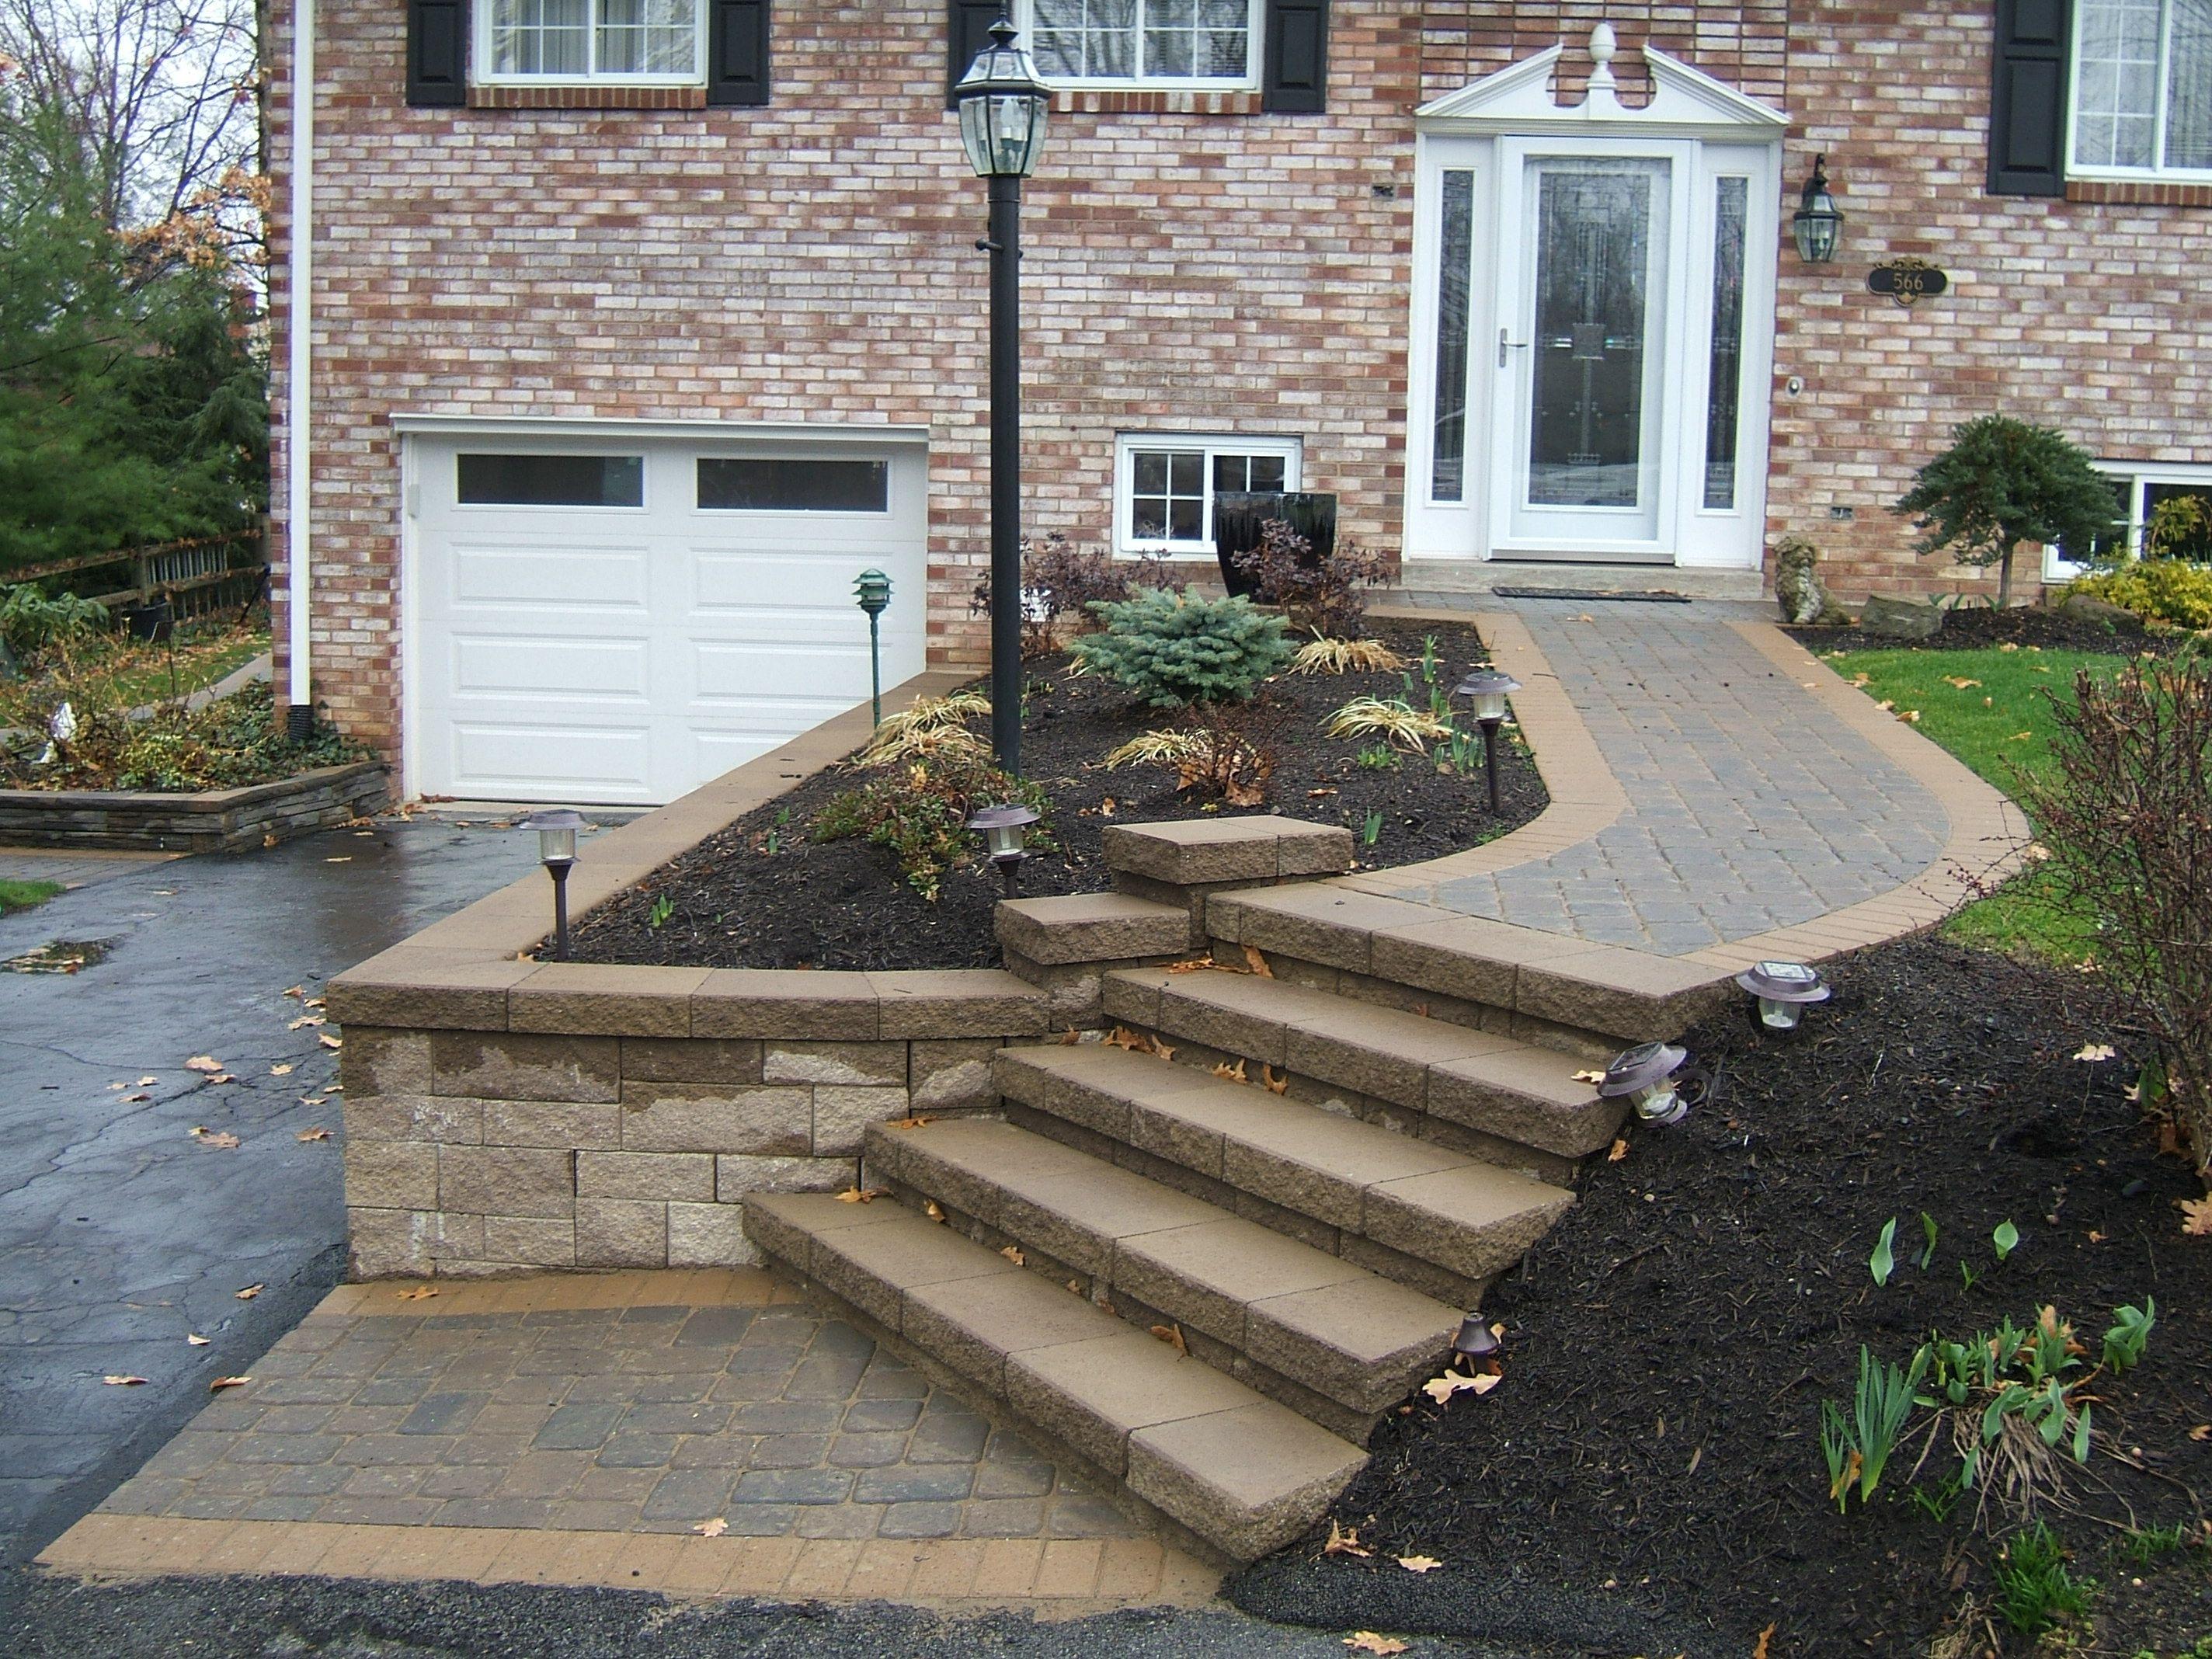 Versa lok Wall & Steps   Landscaping retaining walls, Front porch ...